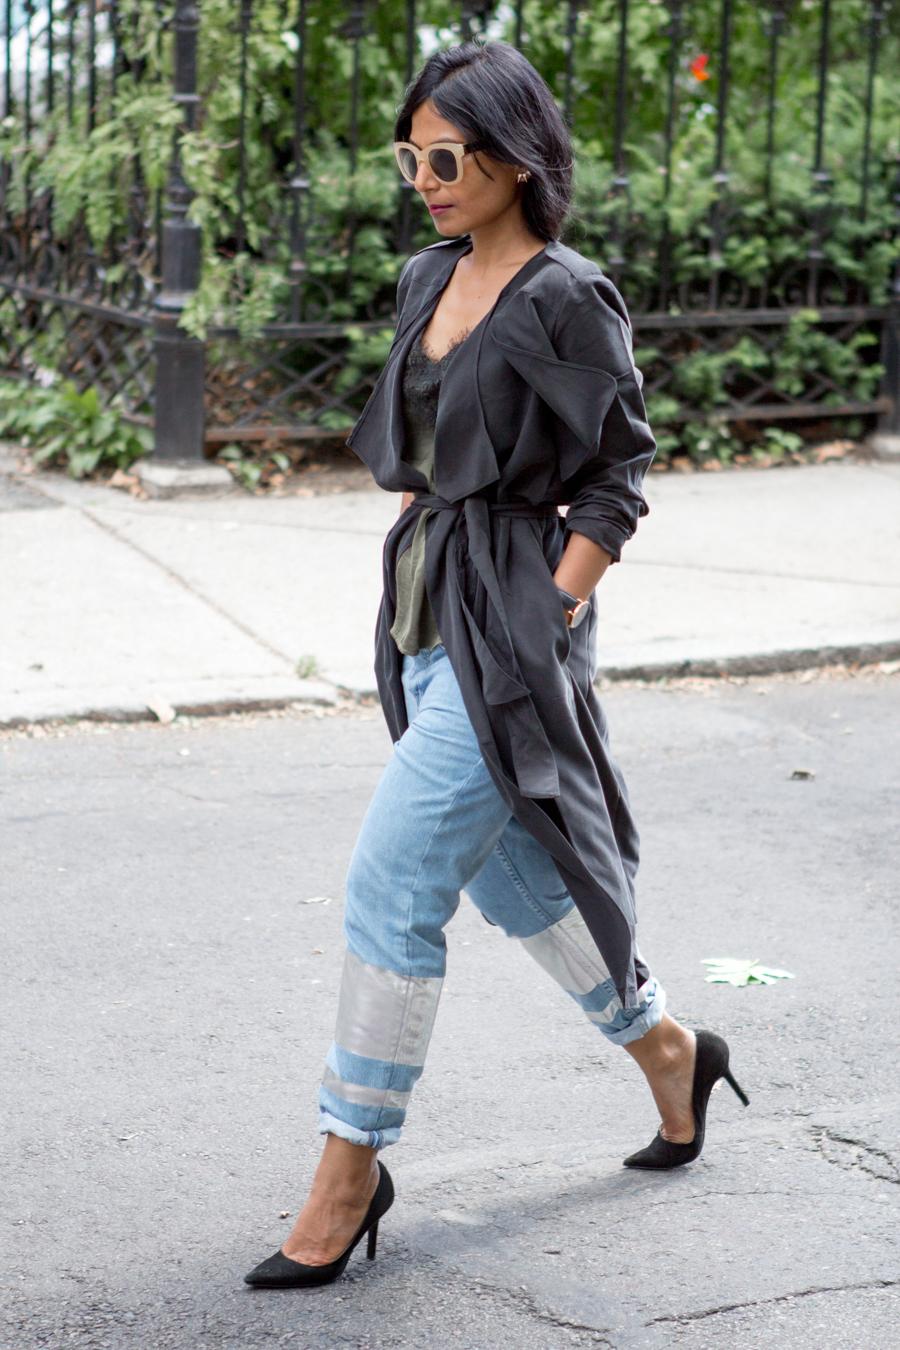 foil, boyfriend jeans, topshop, draped trench, feminine style, street style, boston blogger, petite fashion